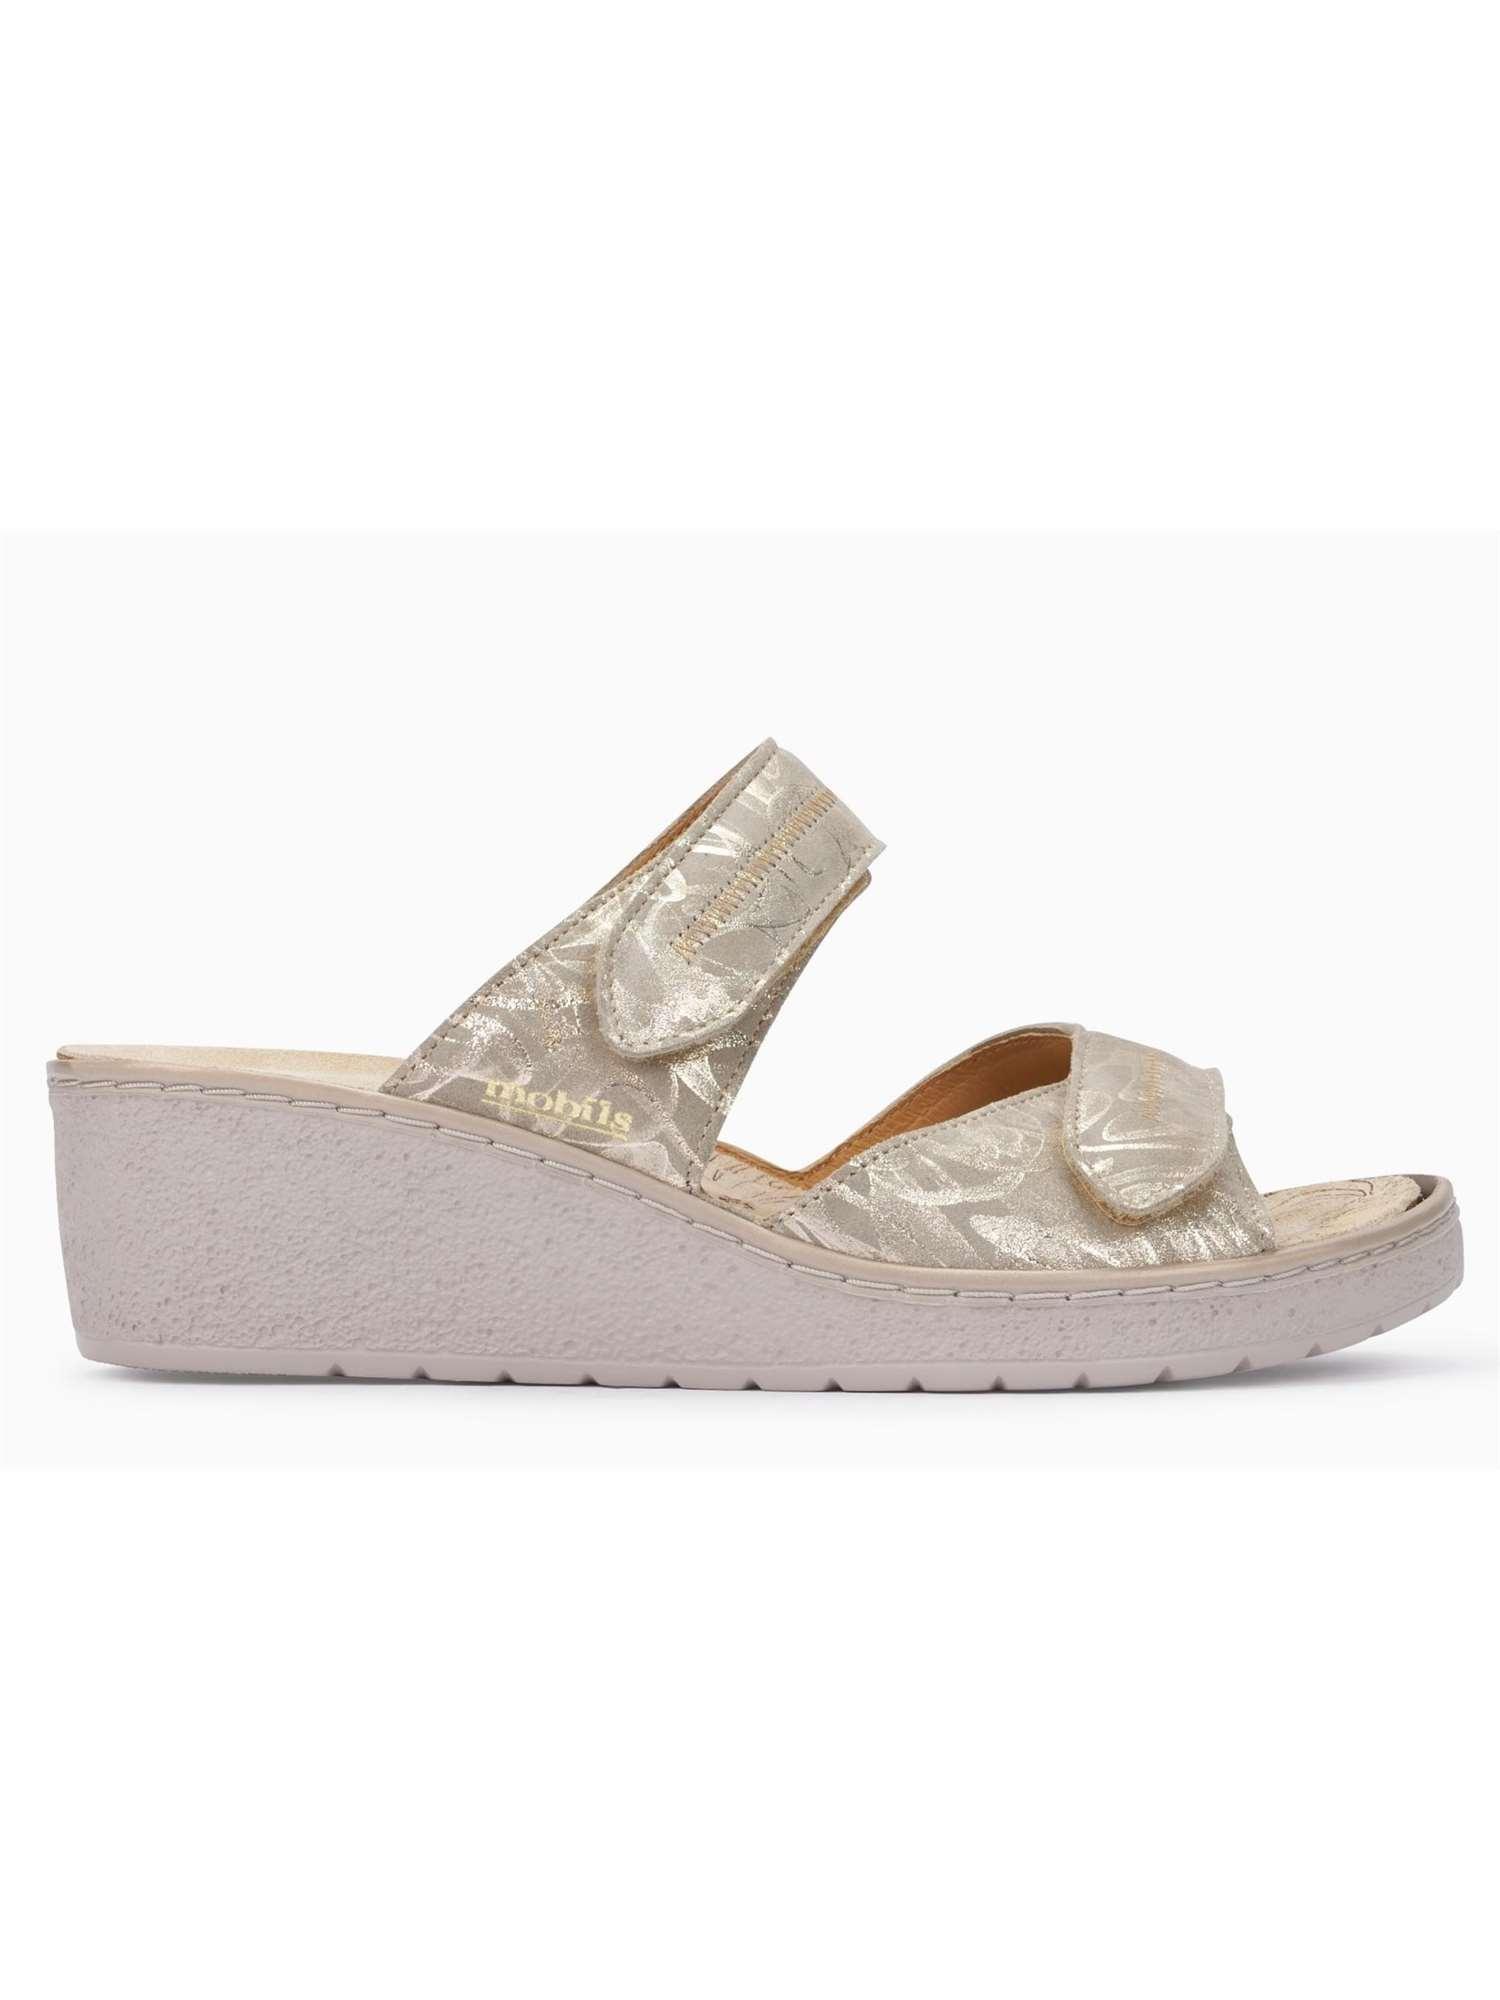 Sandalo Ciabatta Platino Donna Mephisto 1tlfkjc CoBrdxe